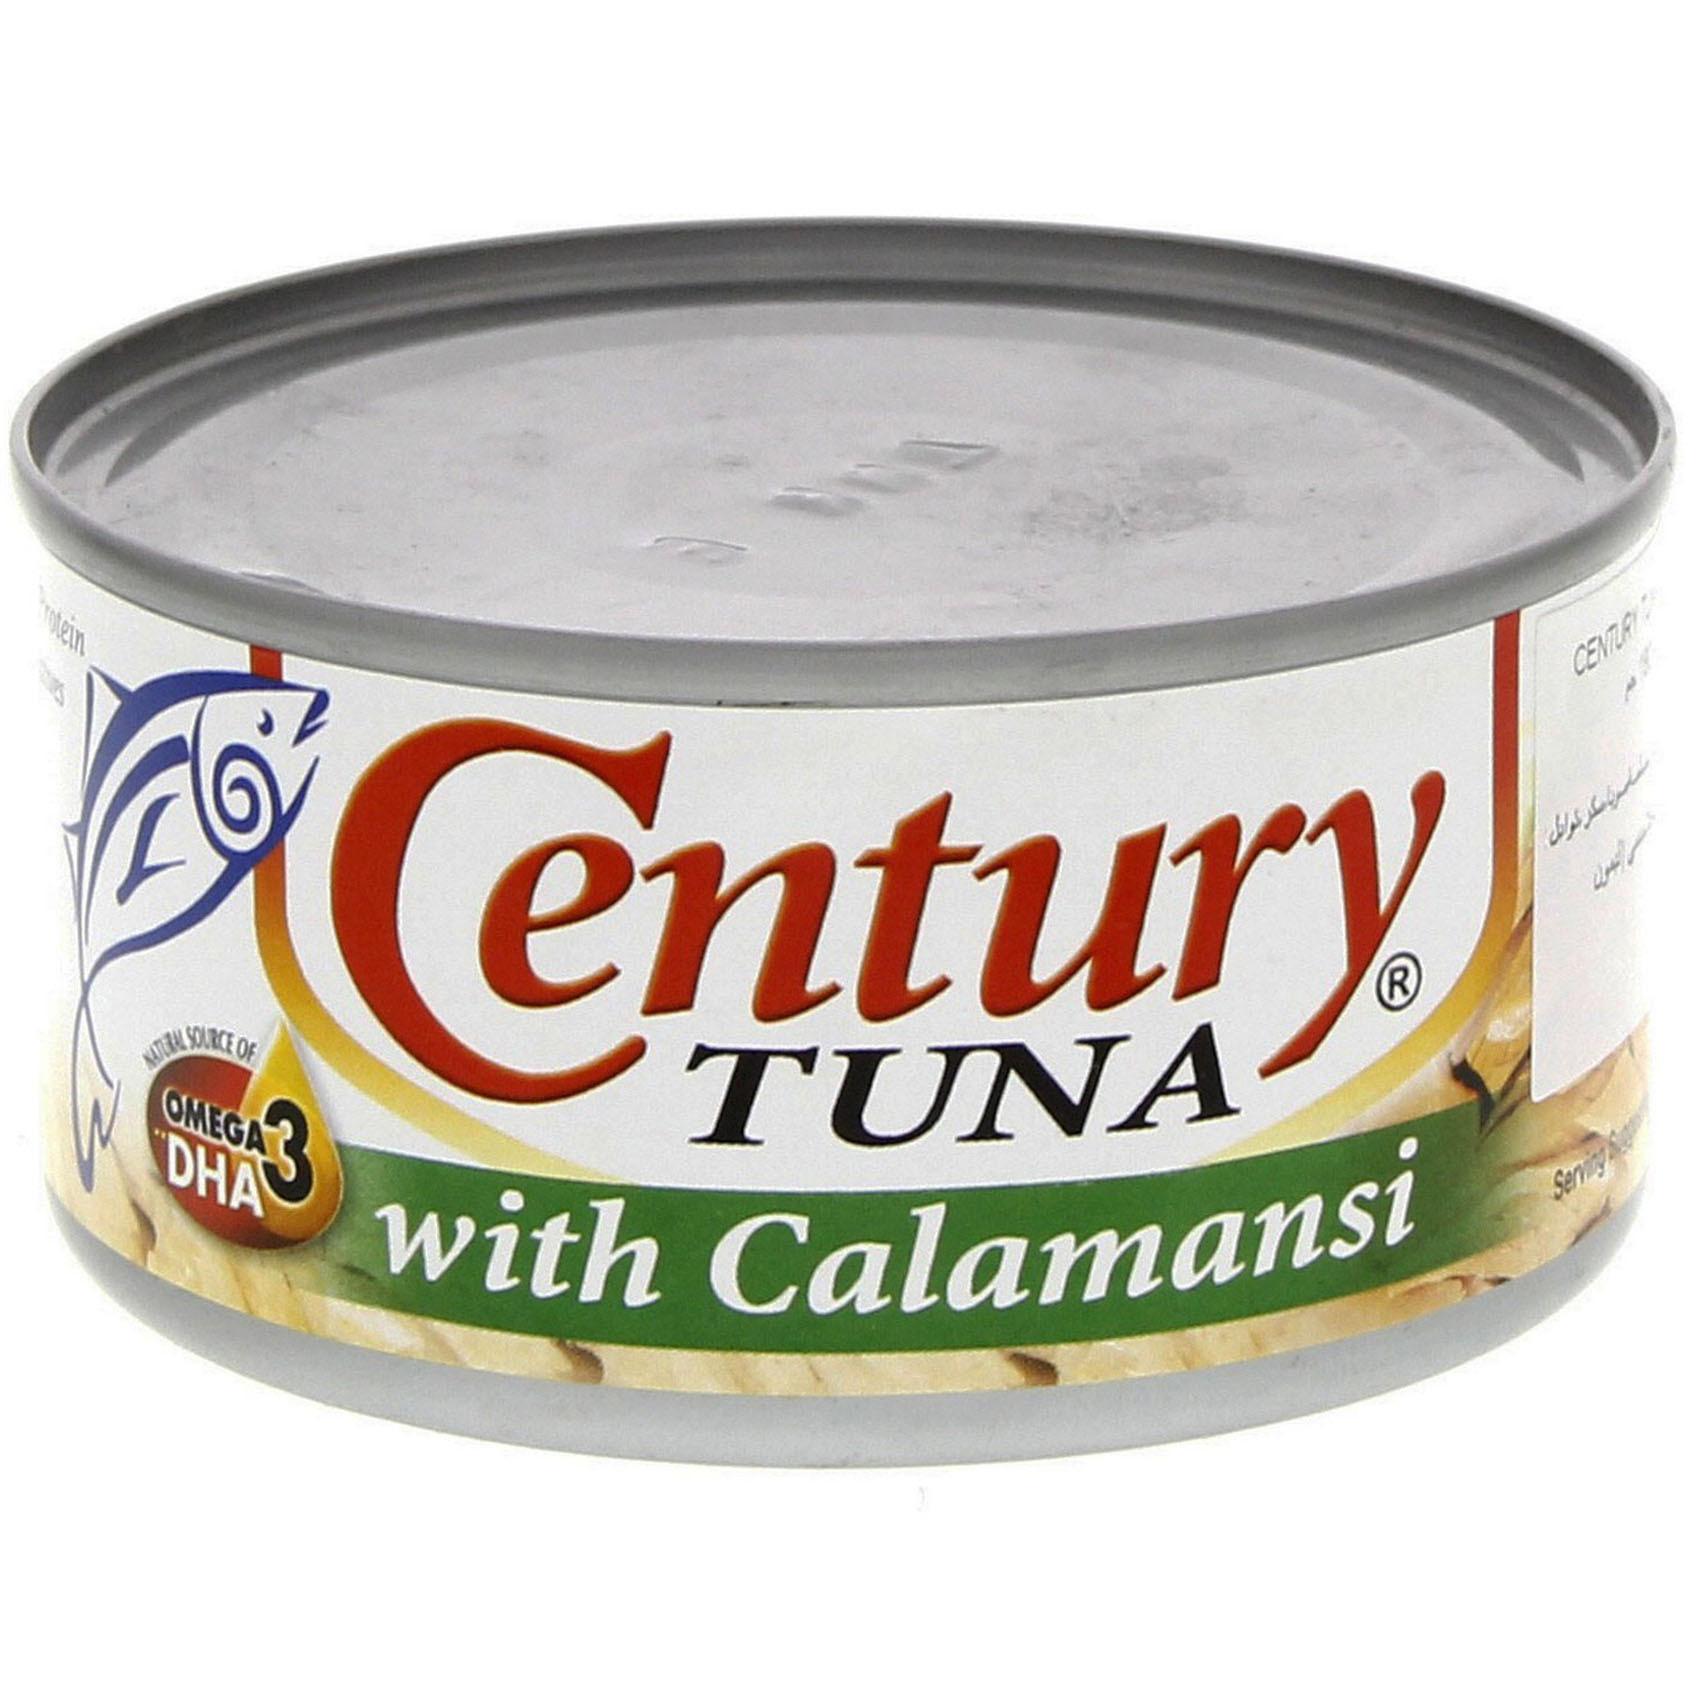 CENTURY TUNA CALAMANSI 180G